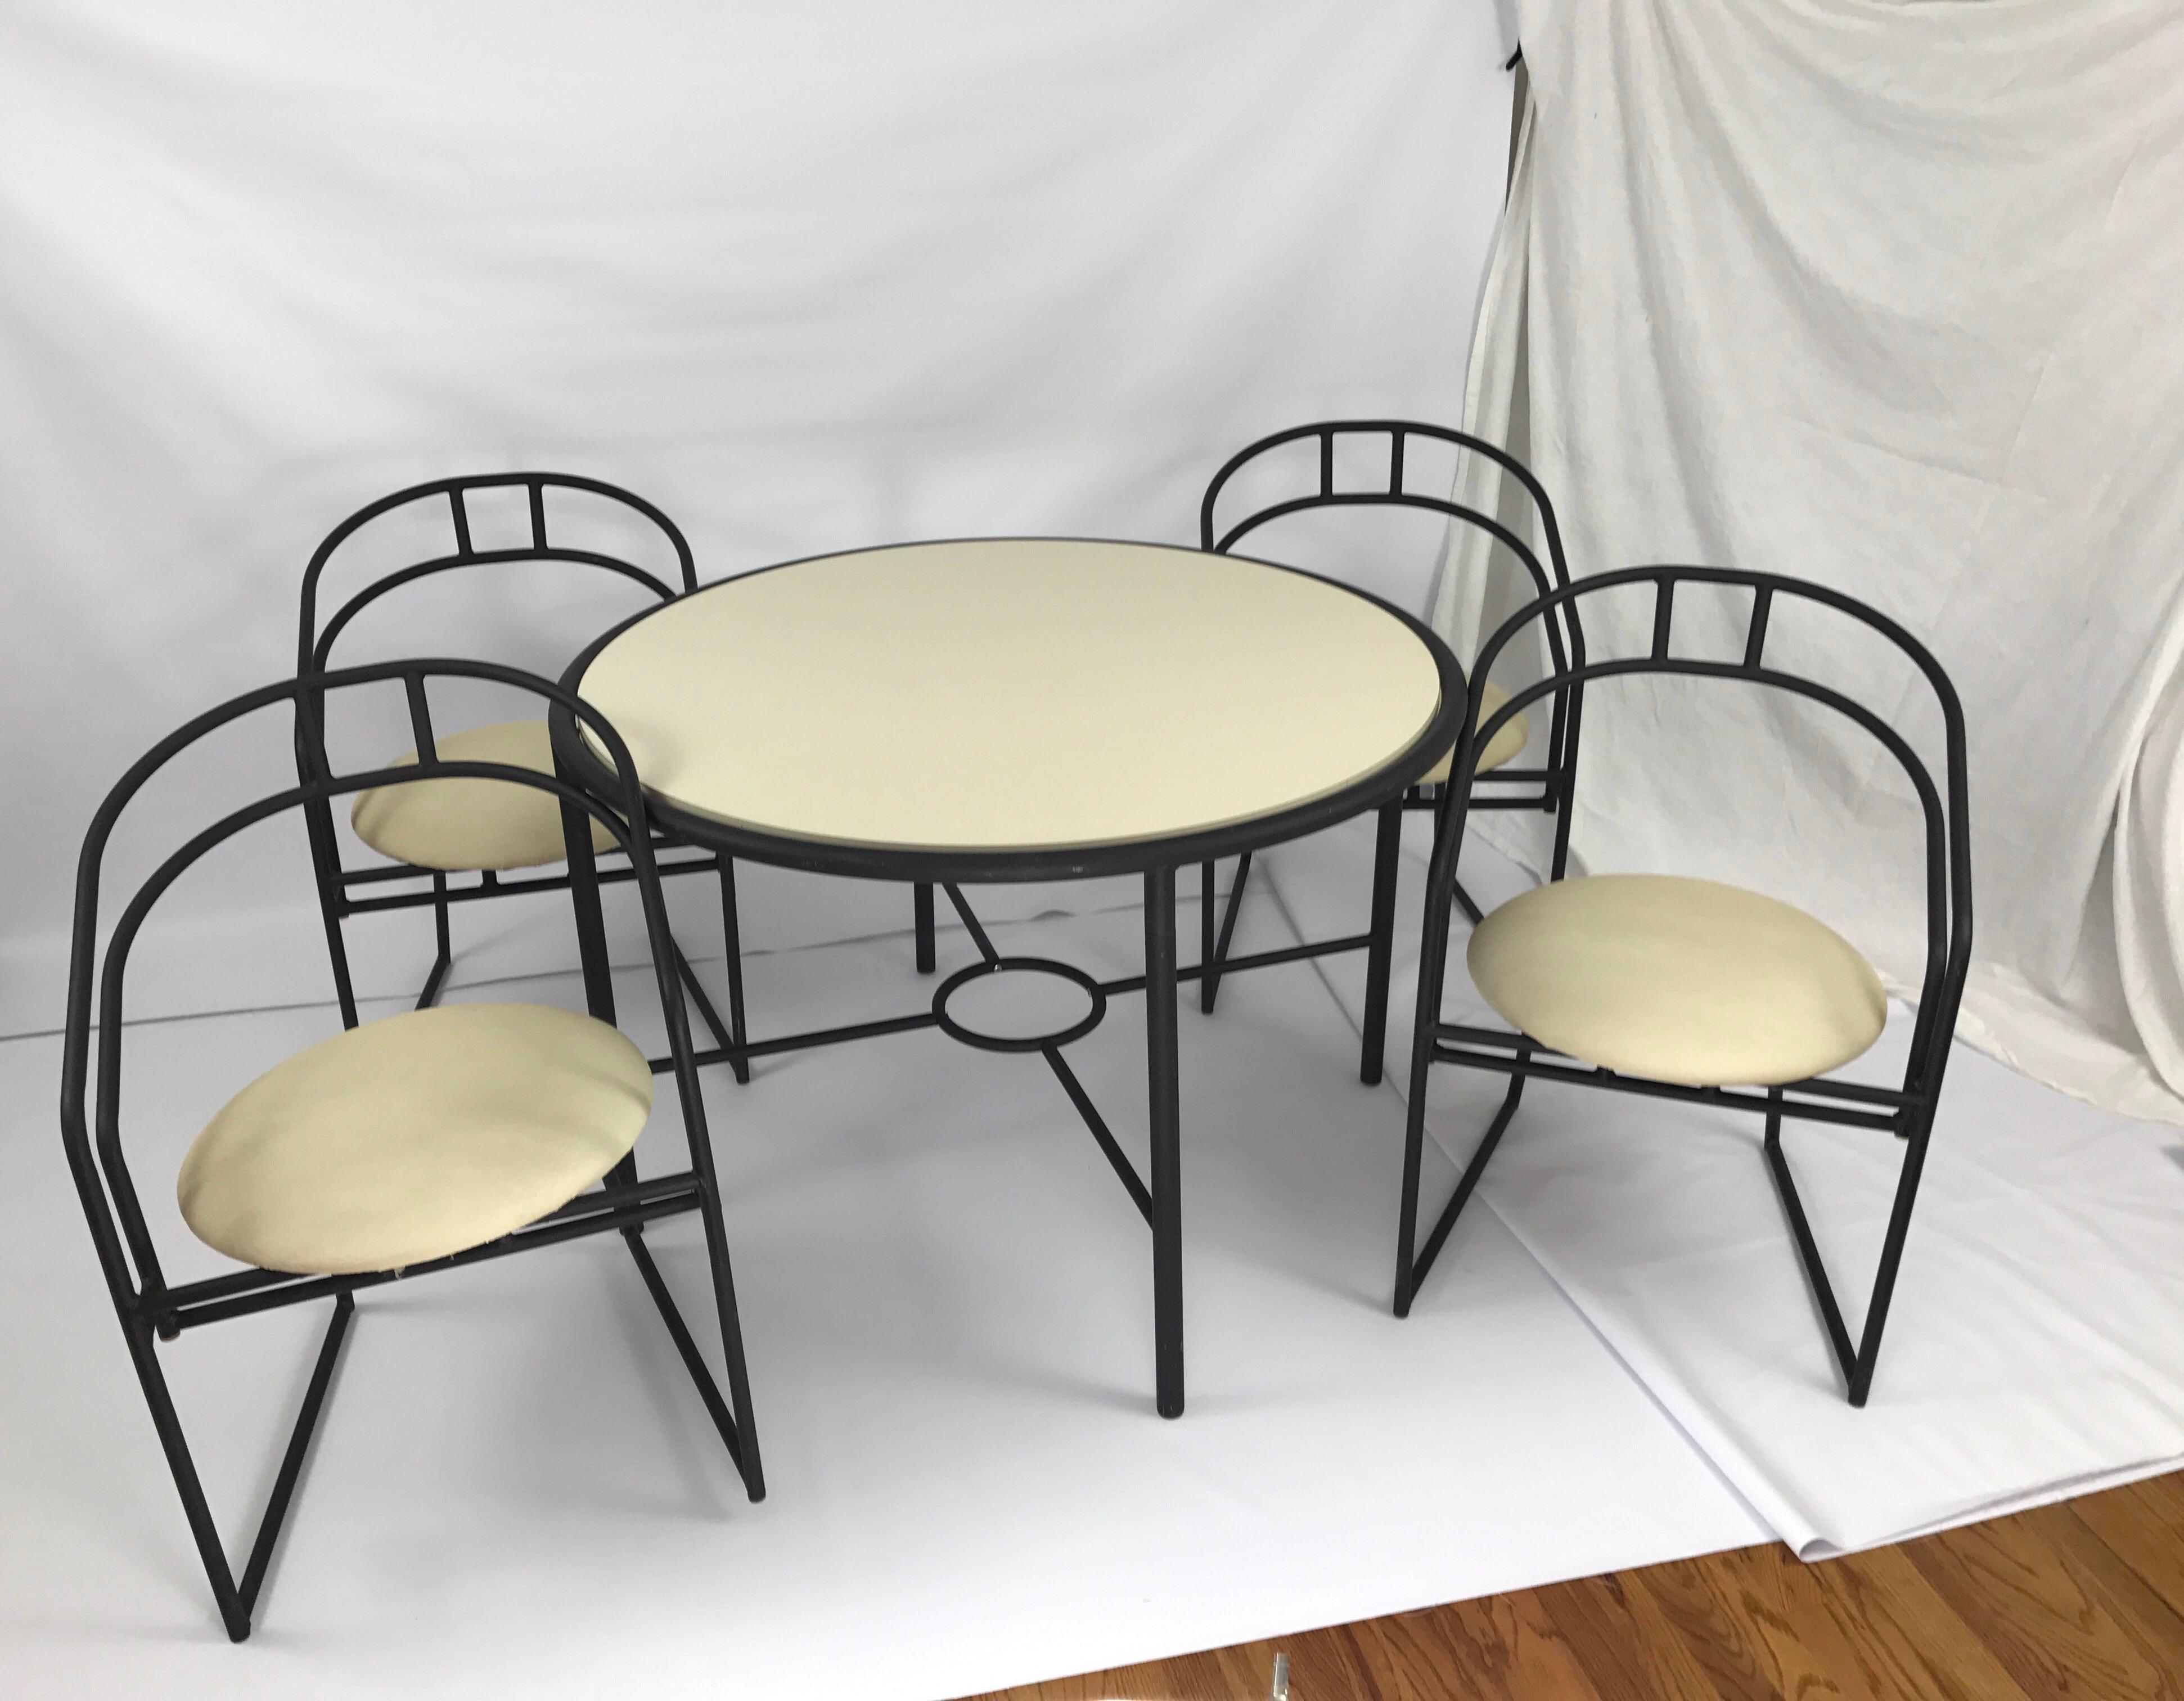 Amazing Vintage Cal Style Furniture Dining Set   Image 2 Of 11